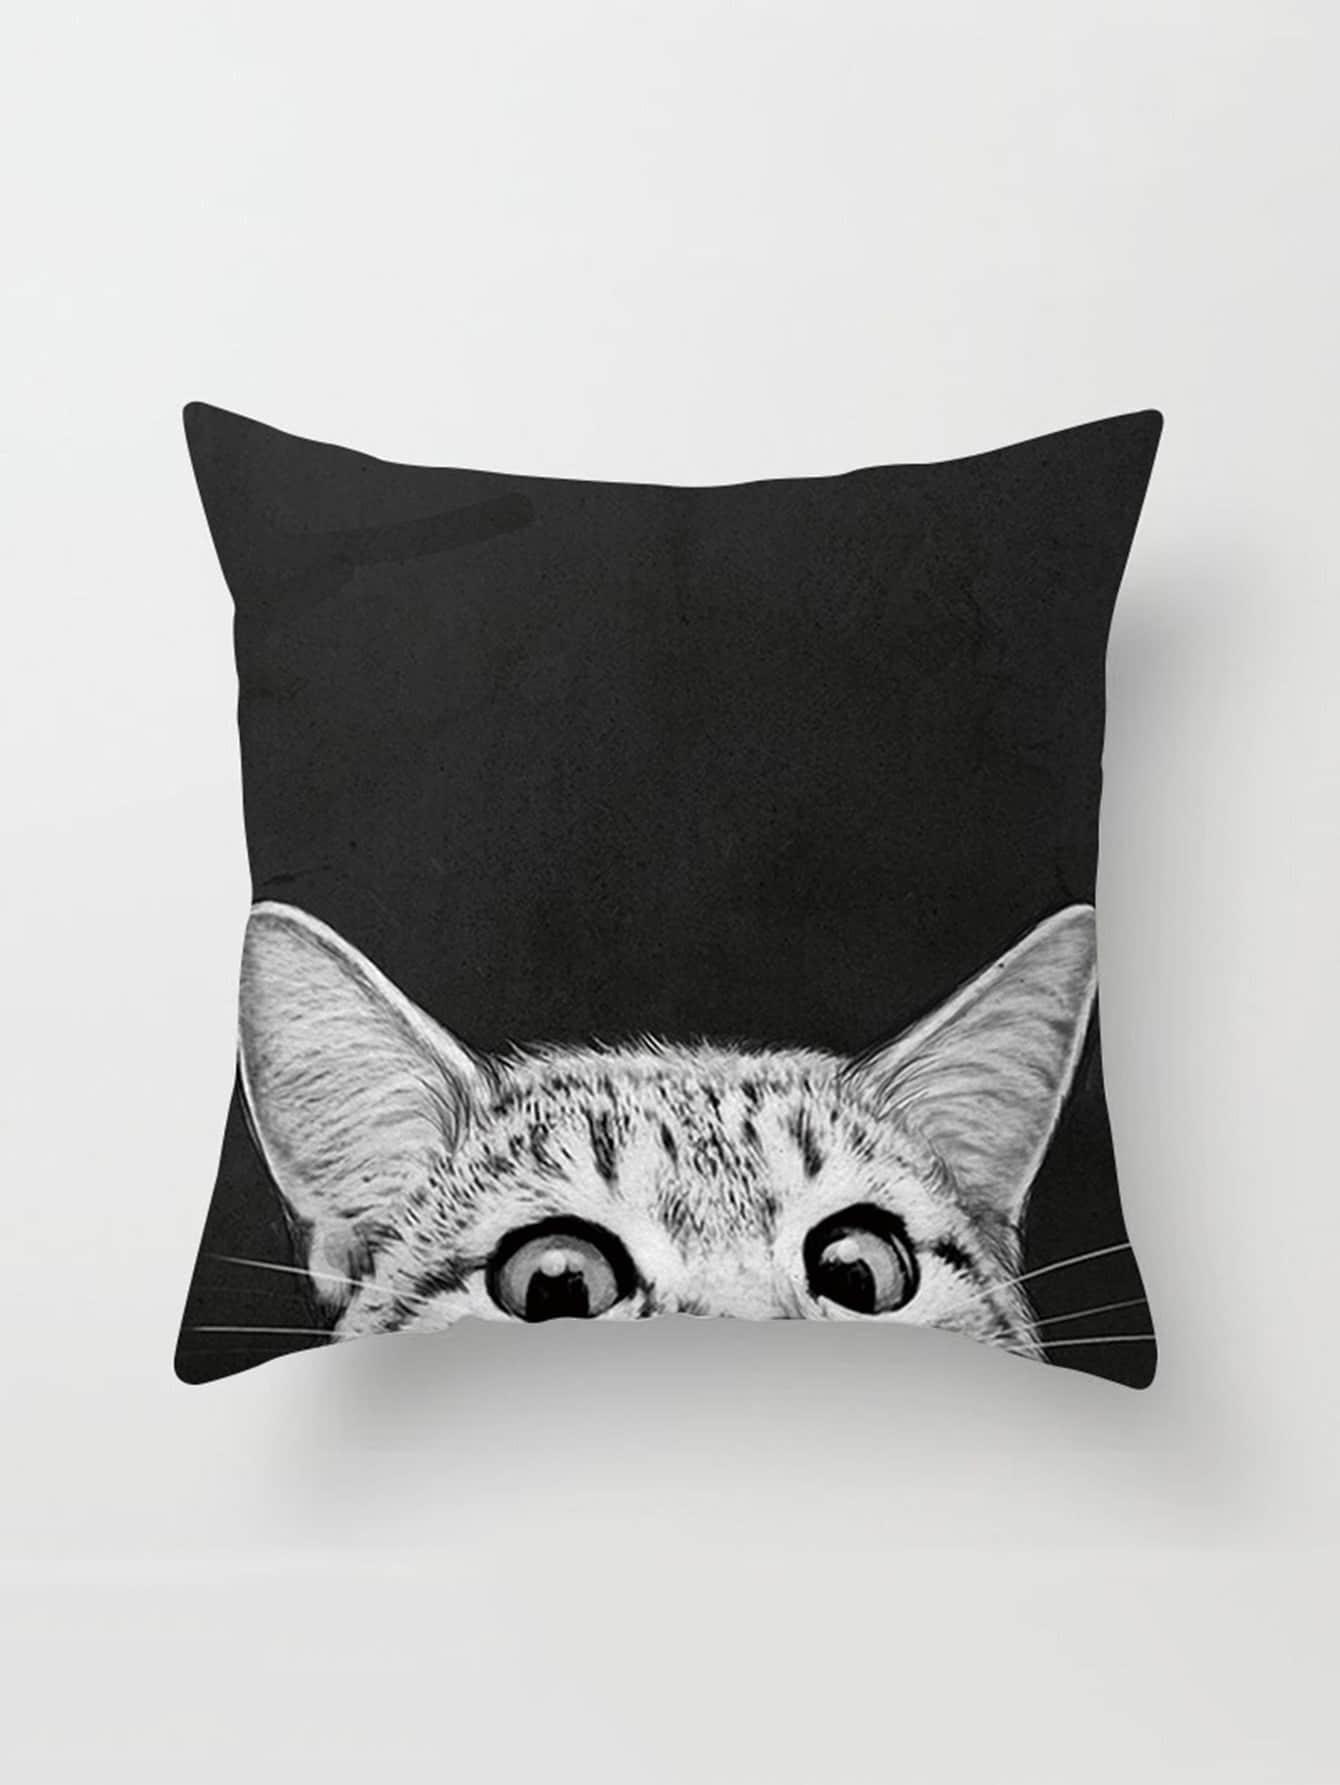 Cat Print Linen Pillowcase Cover panda print linen pillowcase cover